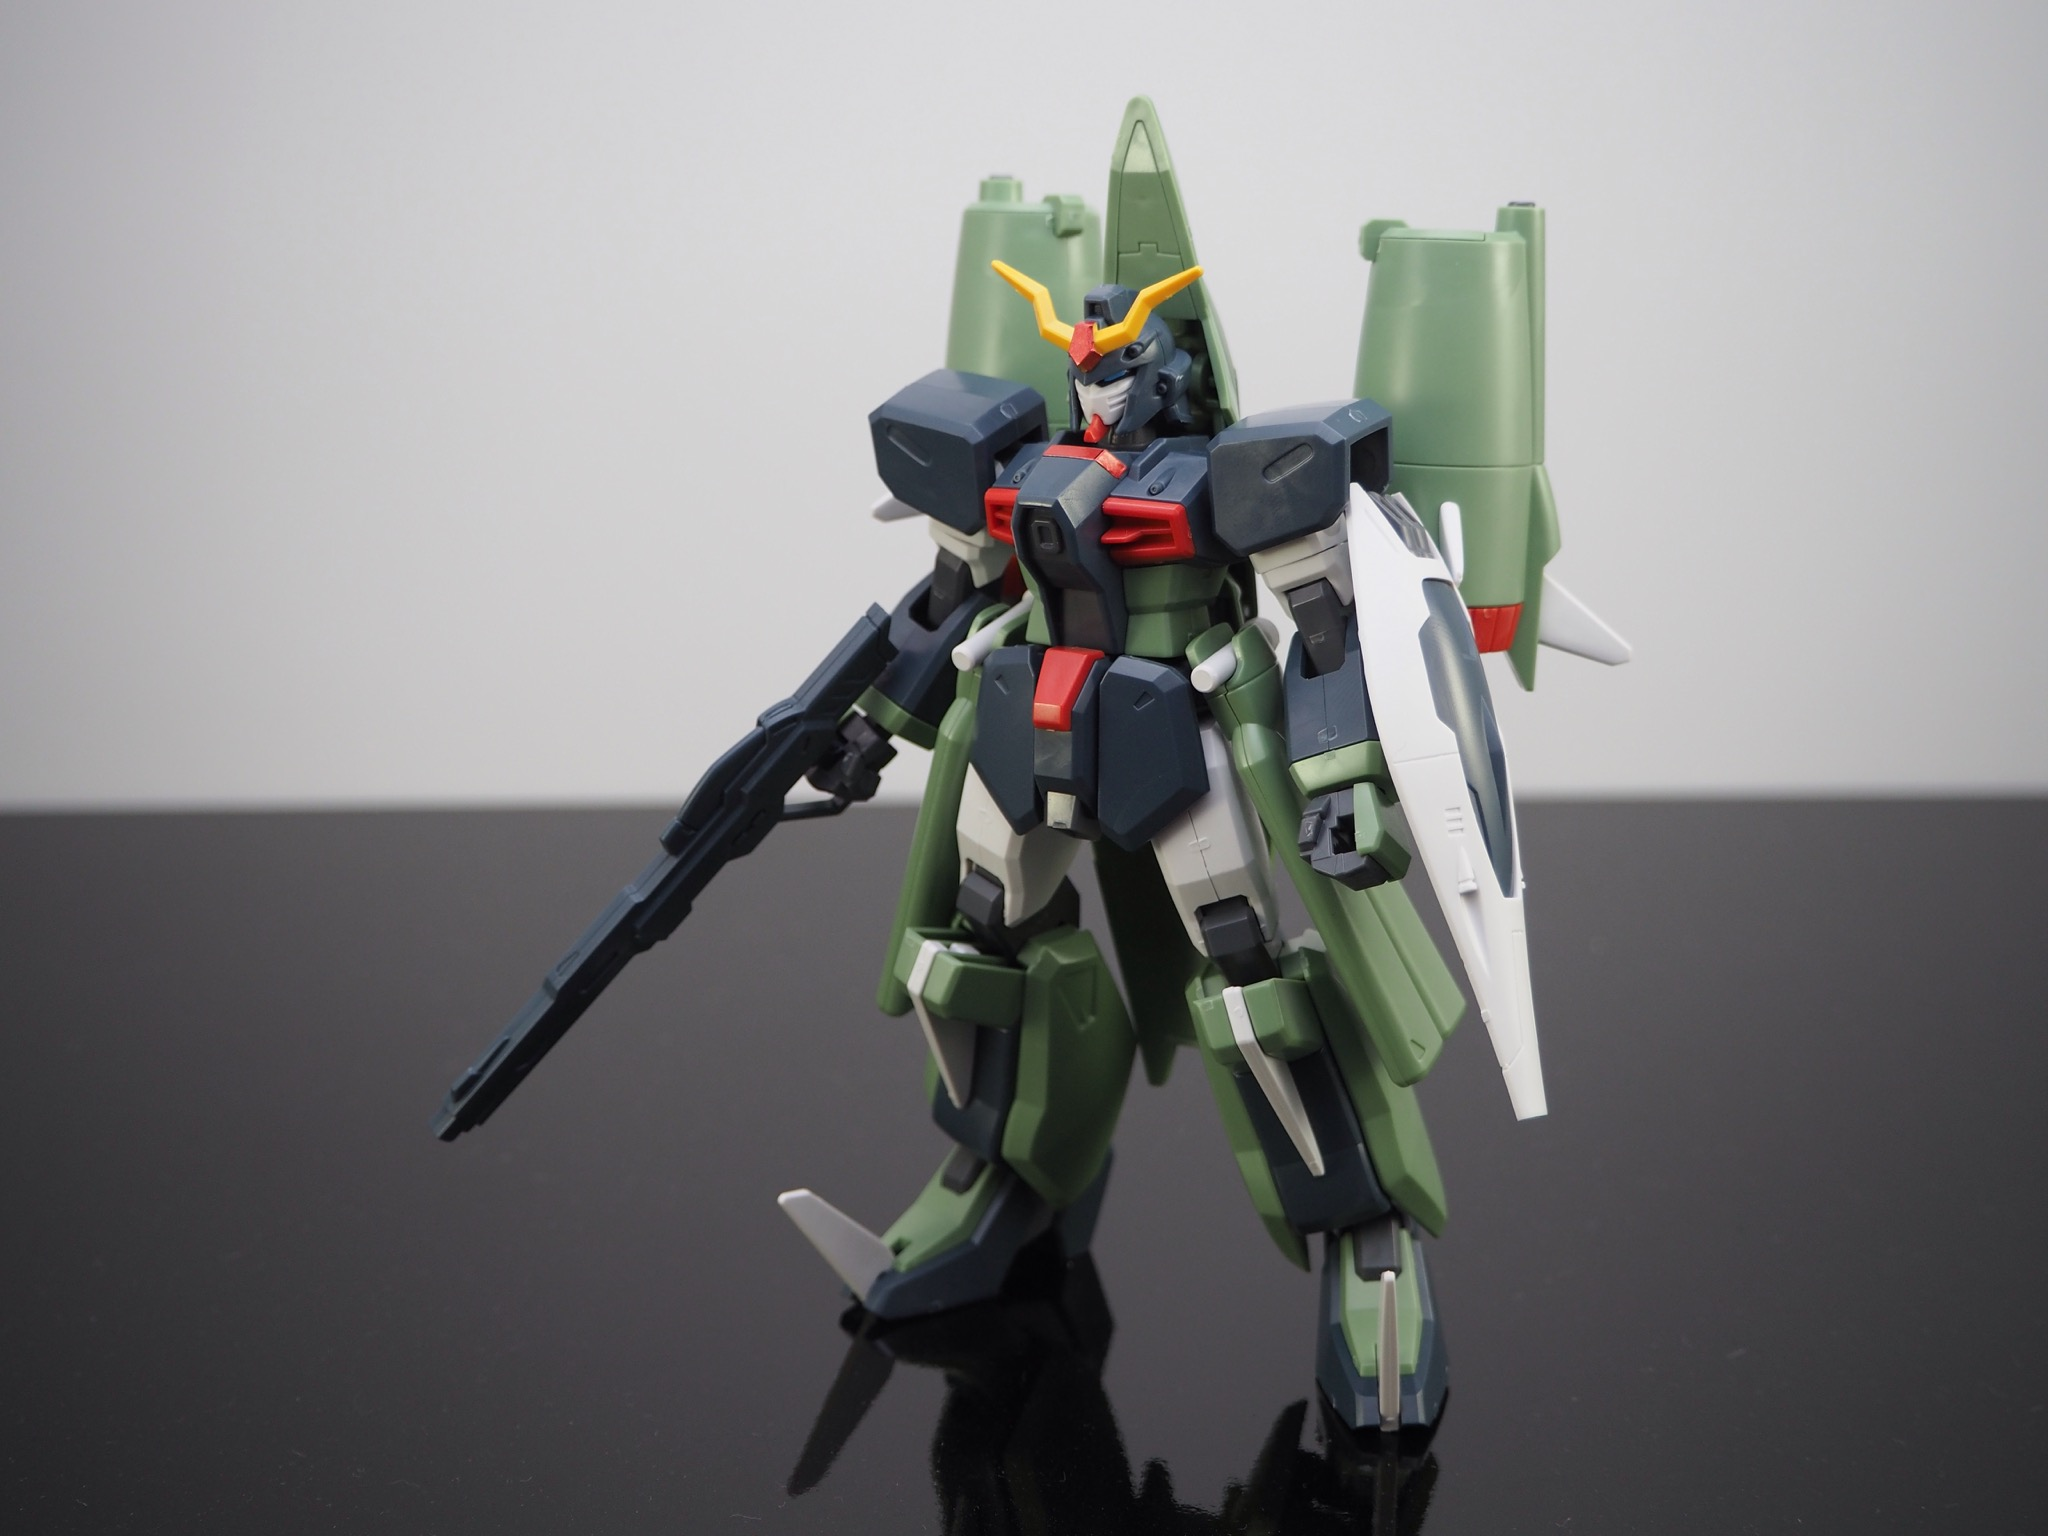 HG 1/144 ZGMF-X24S カオスガンダム [Chaos Gundam]